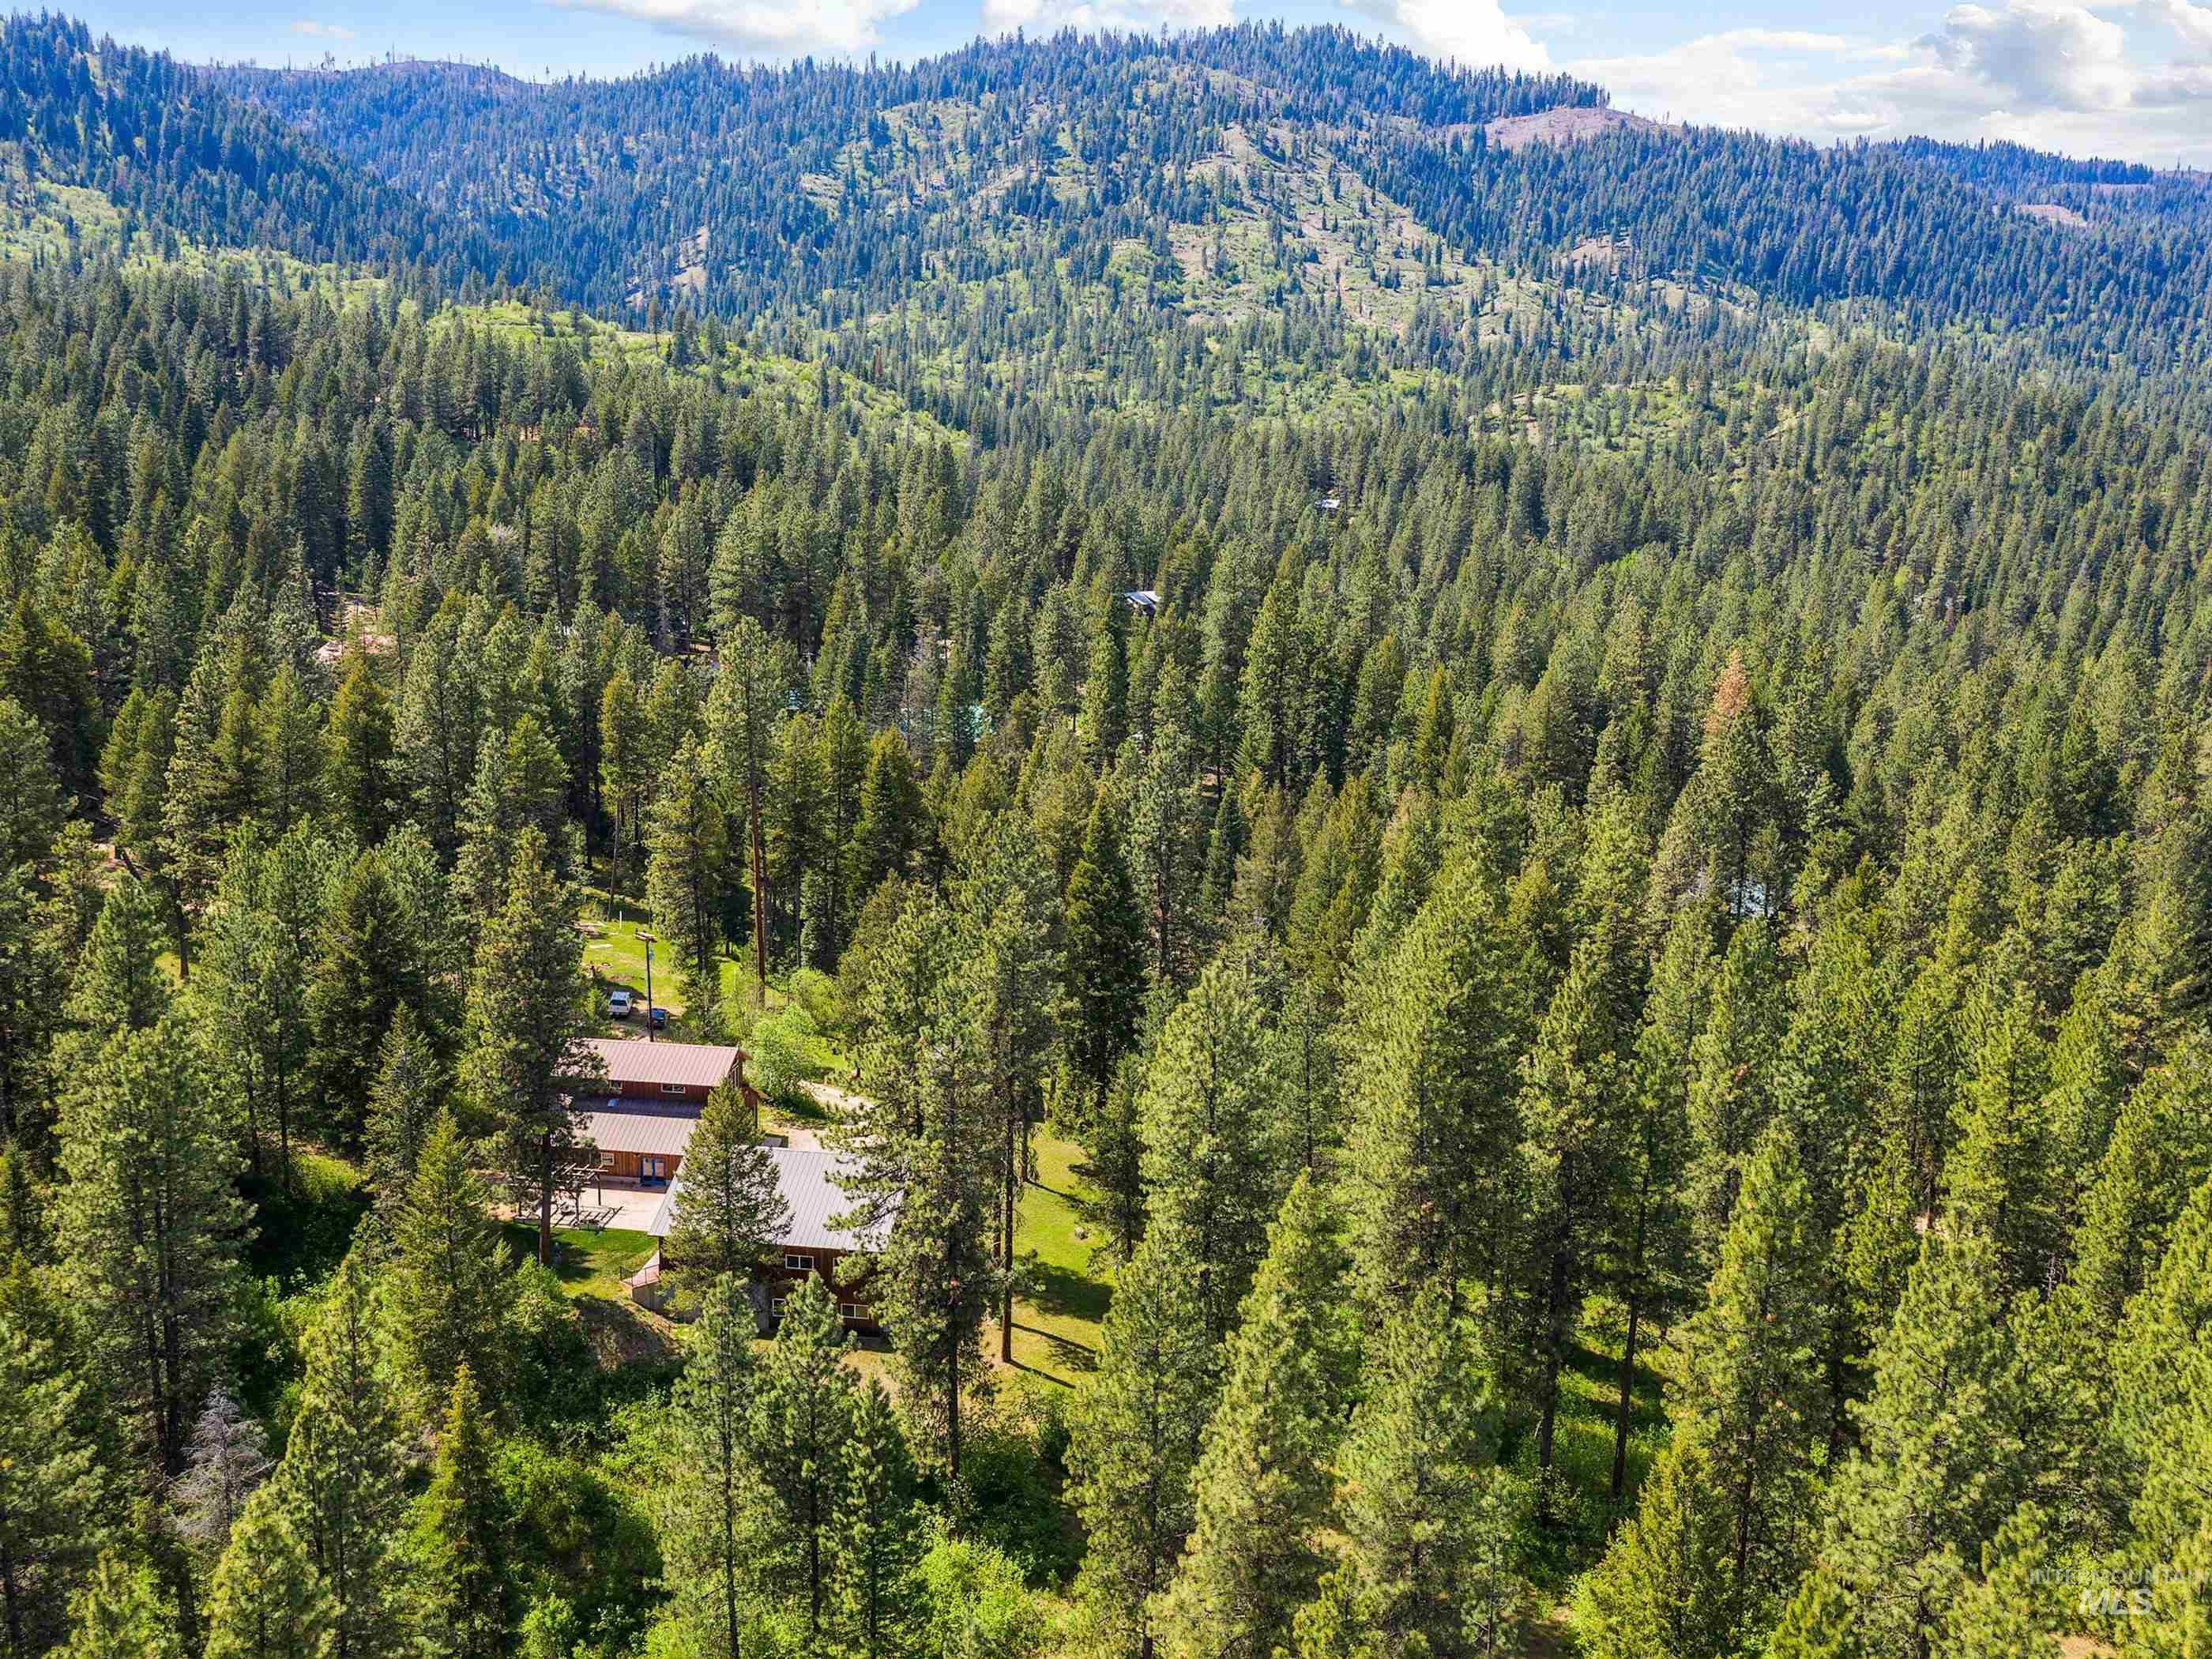 Tbd Deer Trail (lot 20) Property Photo